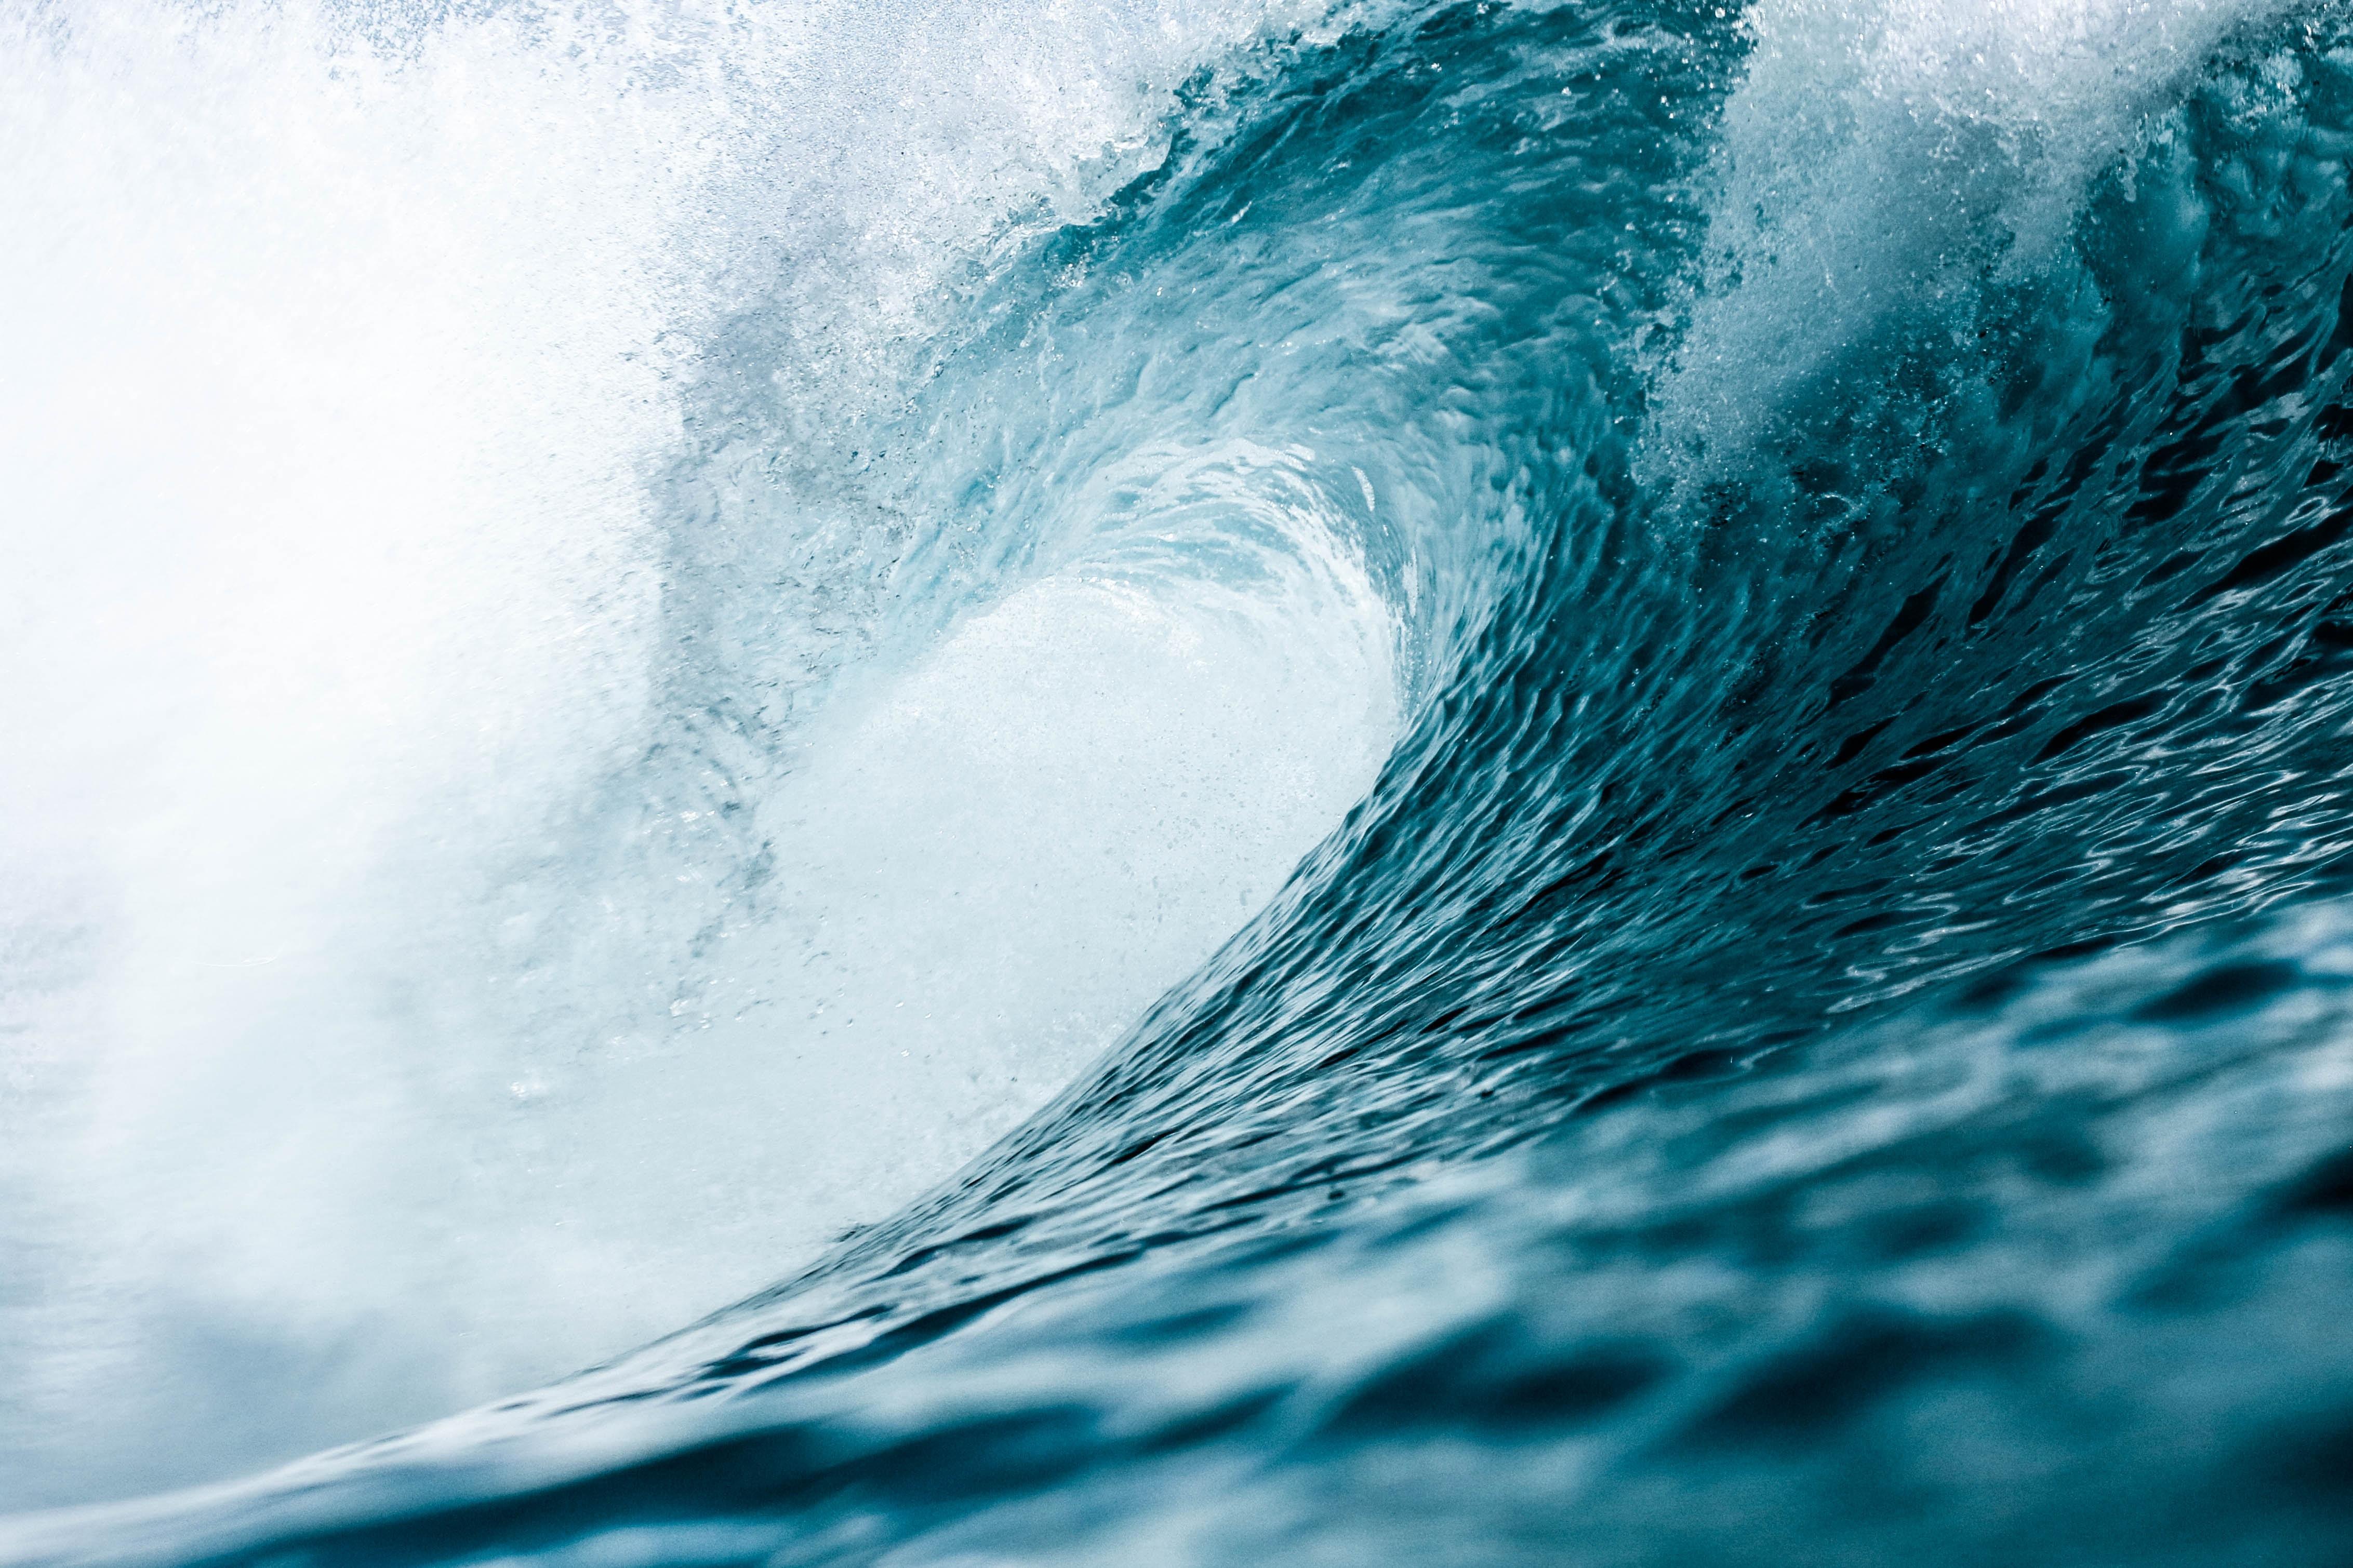 selective focus photo of ocean waves